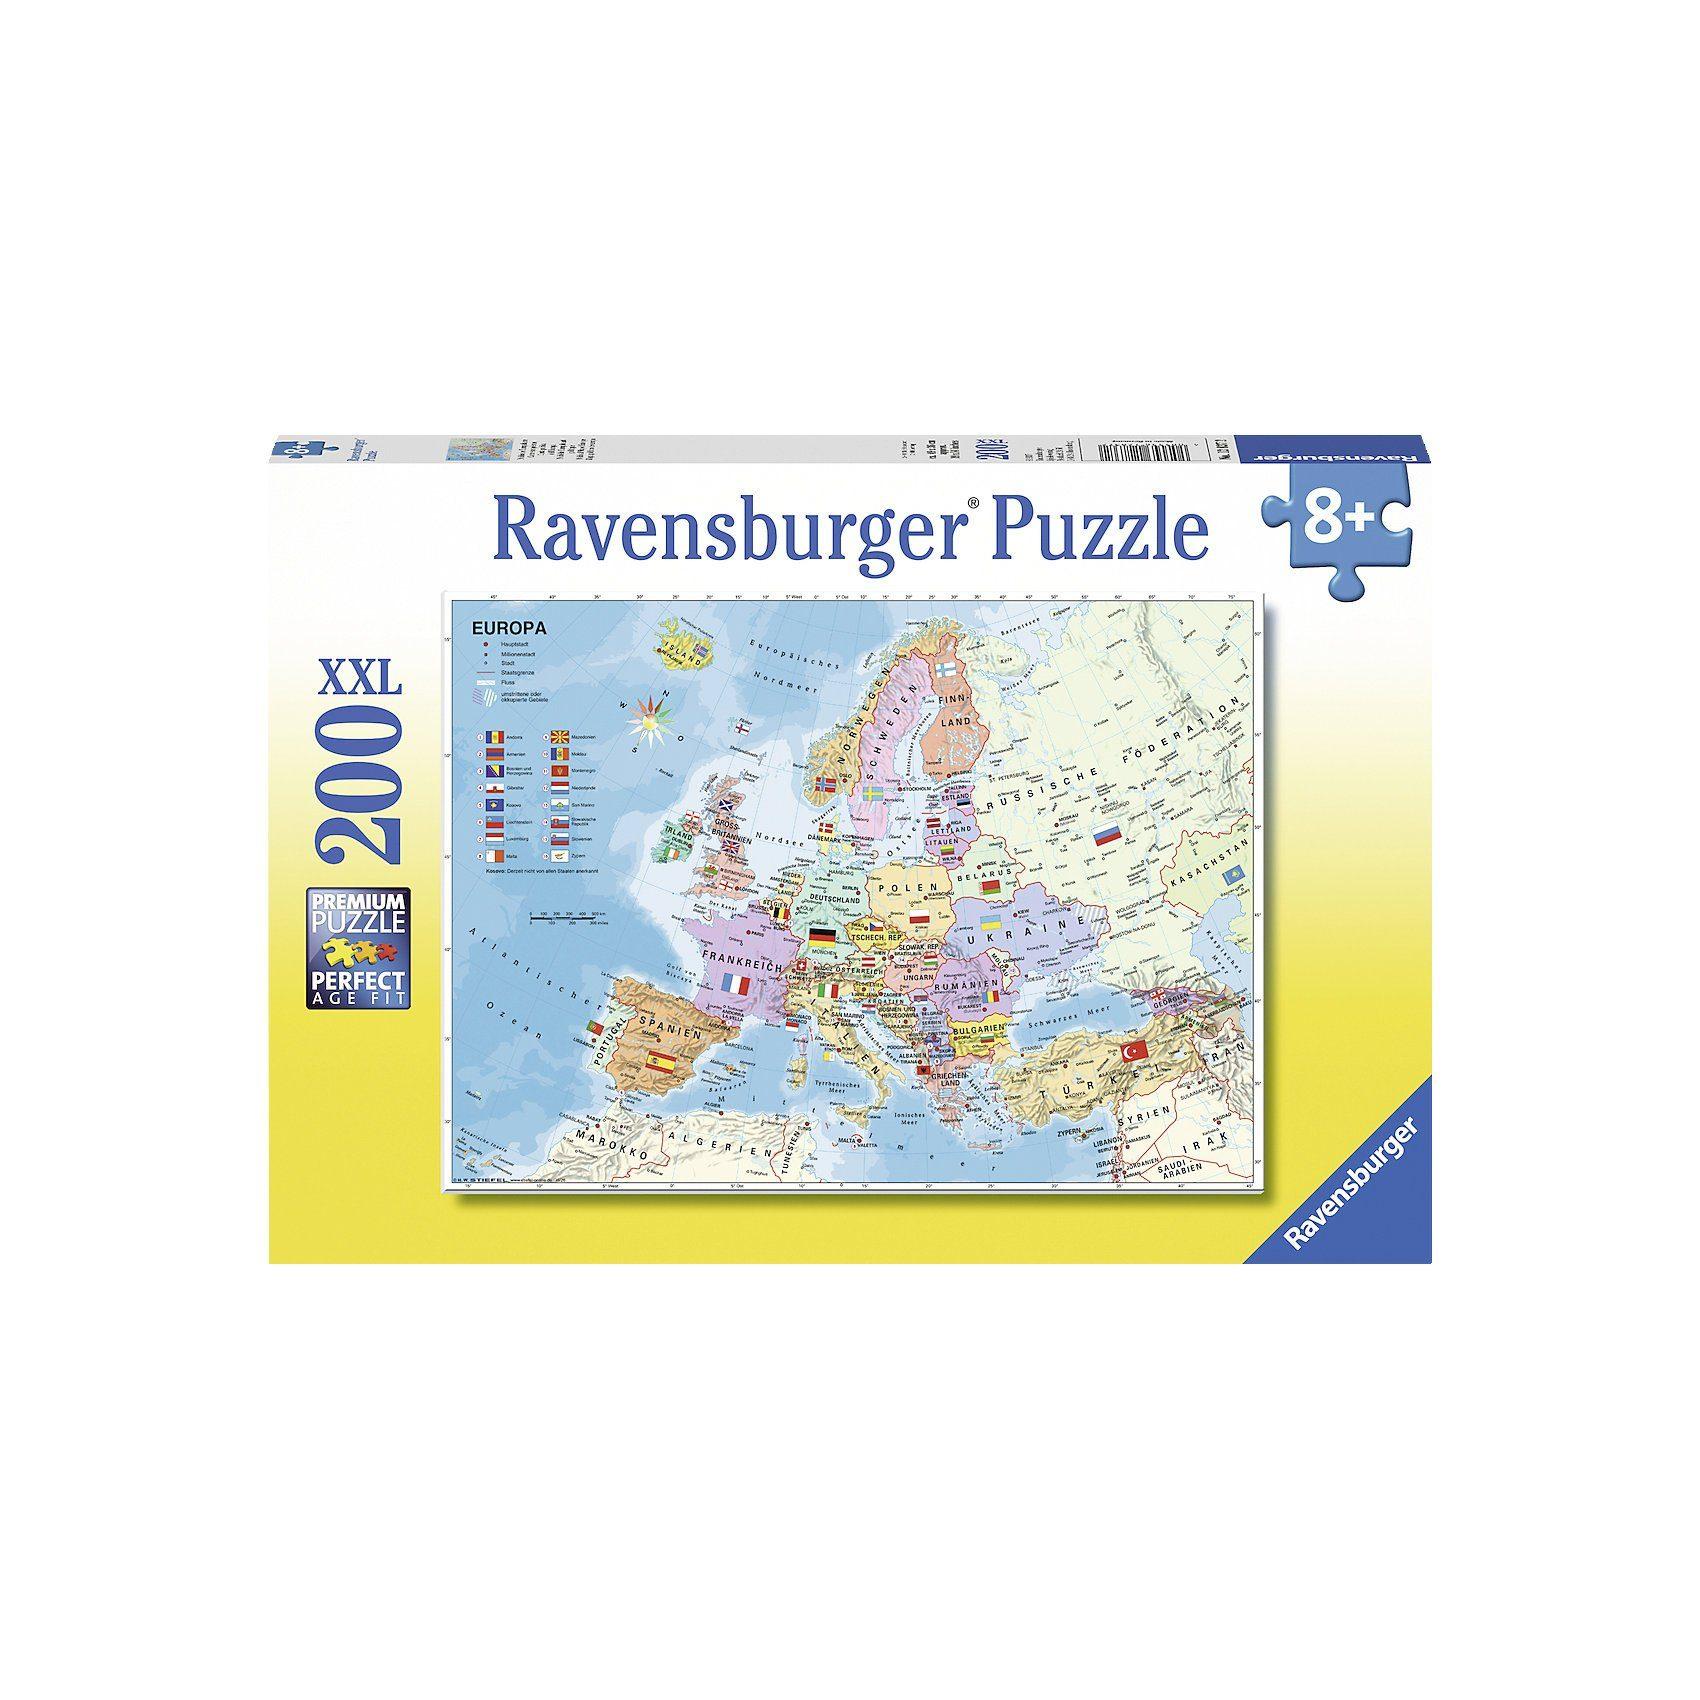 Ravensburger Puzzle, 200 Teile XXL, 49x36 cm, Politische Europakarte